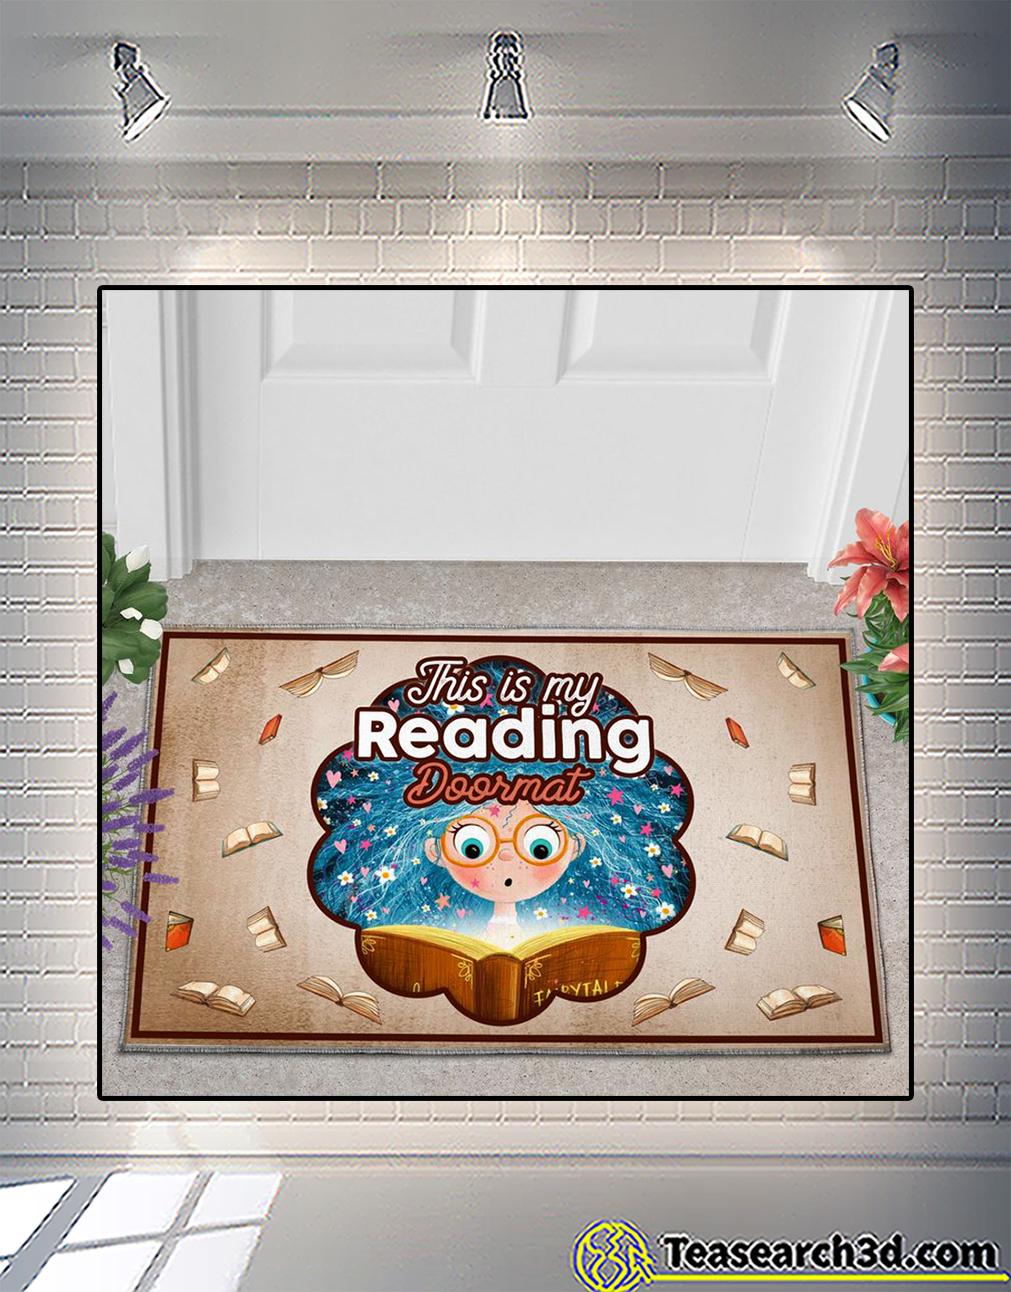 This is my reading doormat